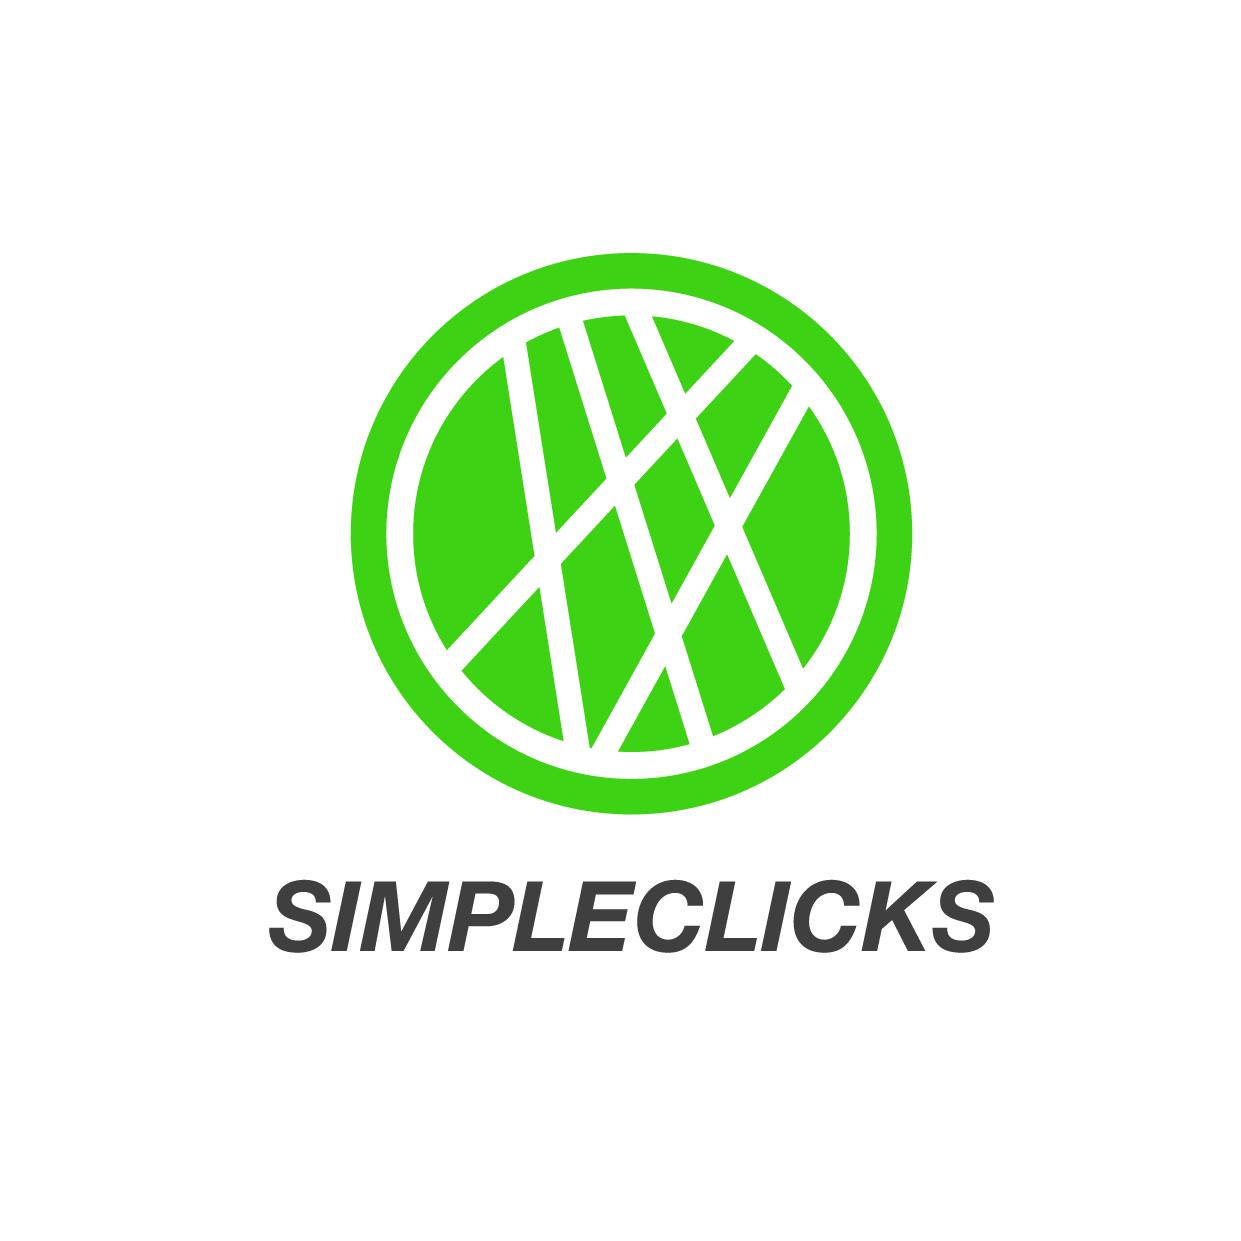 Logo_SimpleClicks_Zeichenfläche 1.jpg